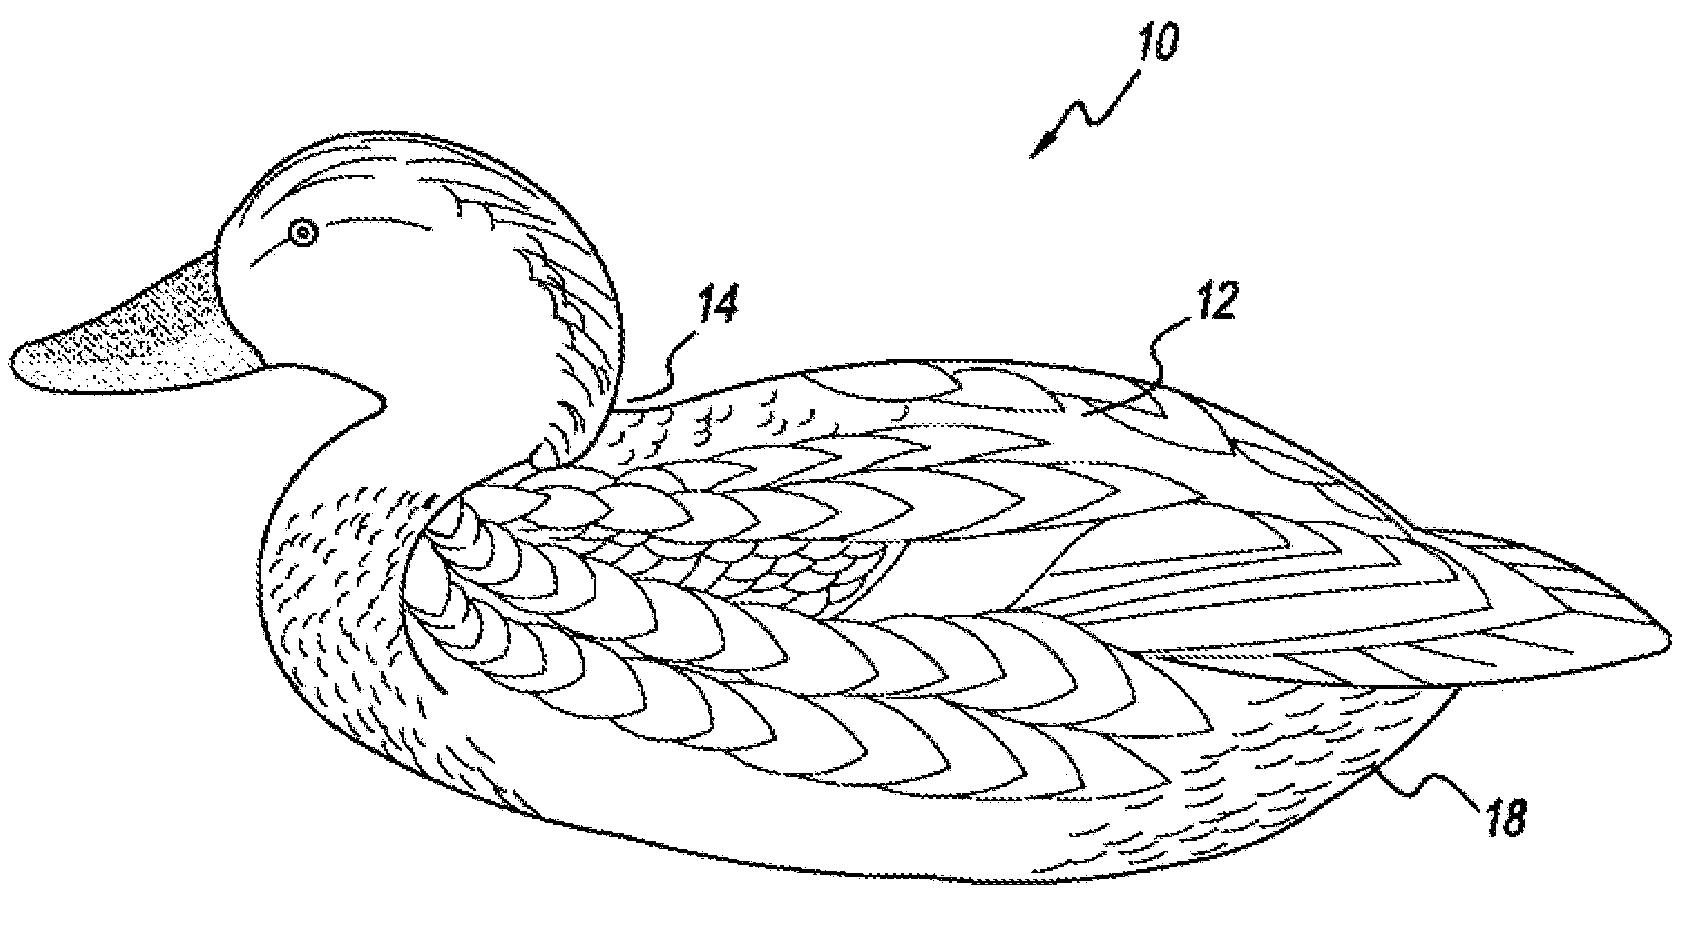 Easy Mallard Duck Drawings | www.imgkid.com - The Image ...